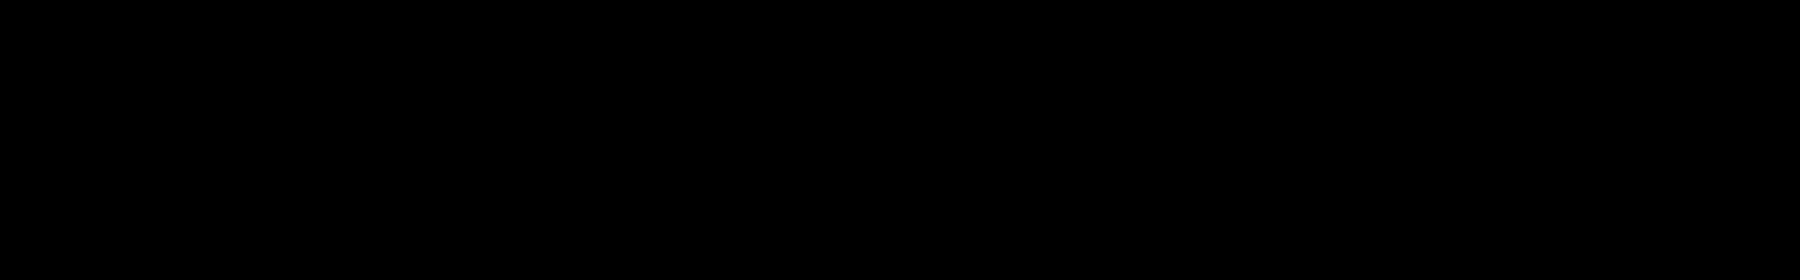 Techno Loops audio waveform